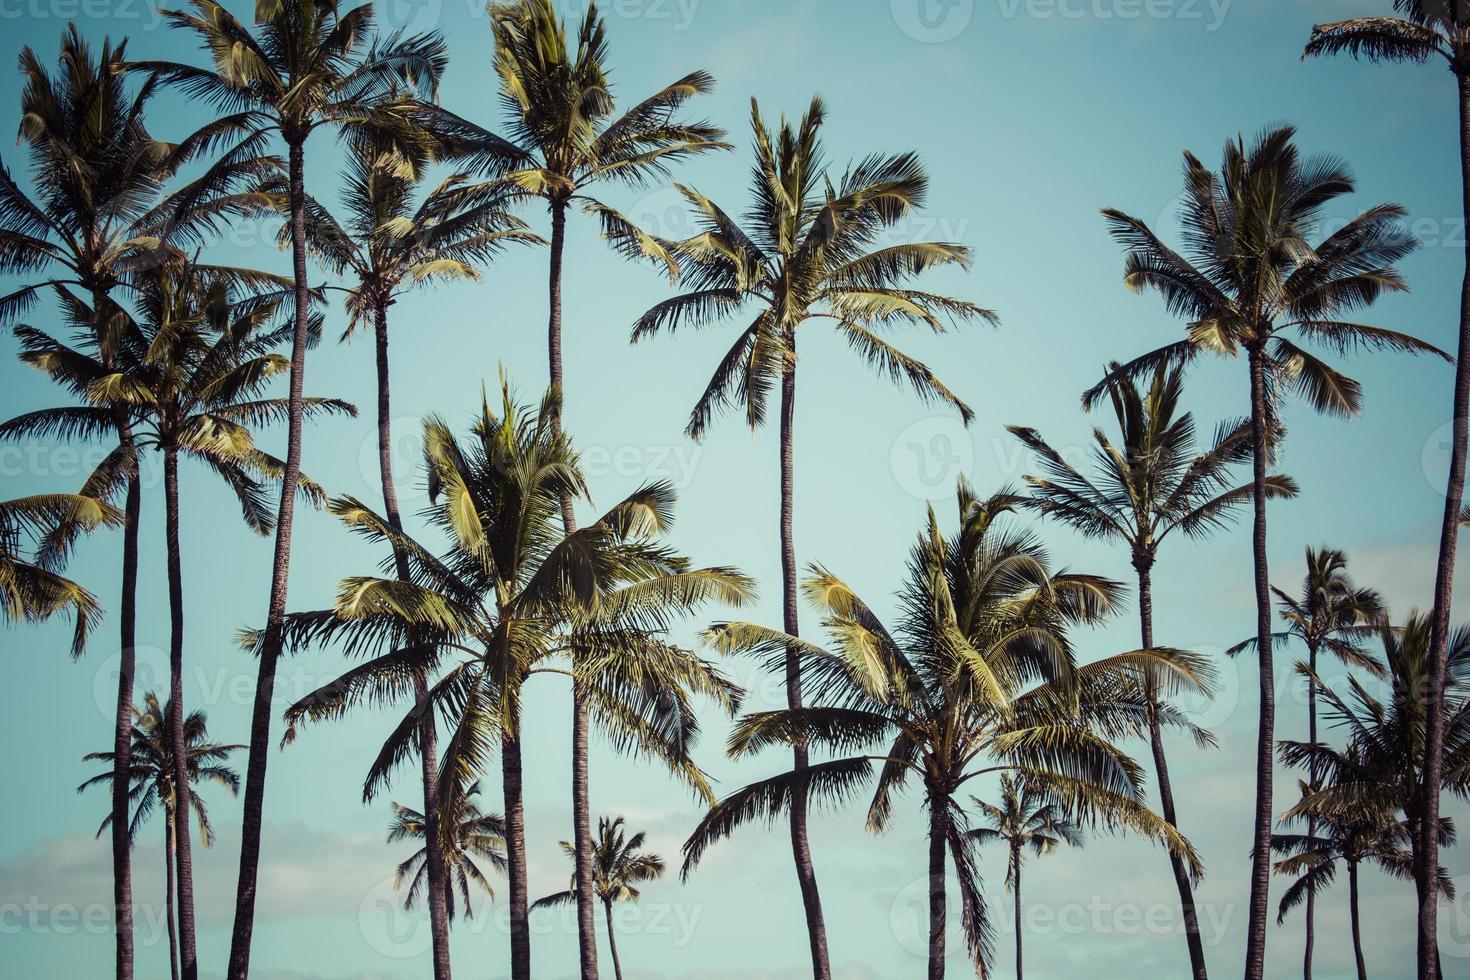 kokospalm in Hawaï, Verenigde Staten. foto